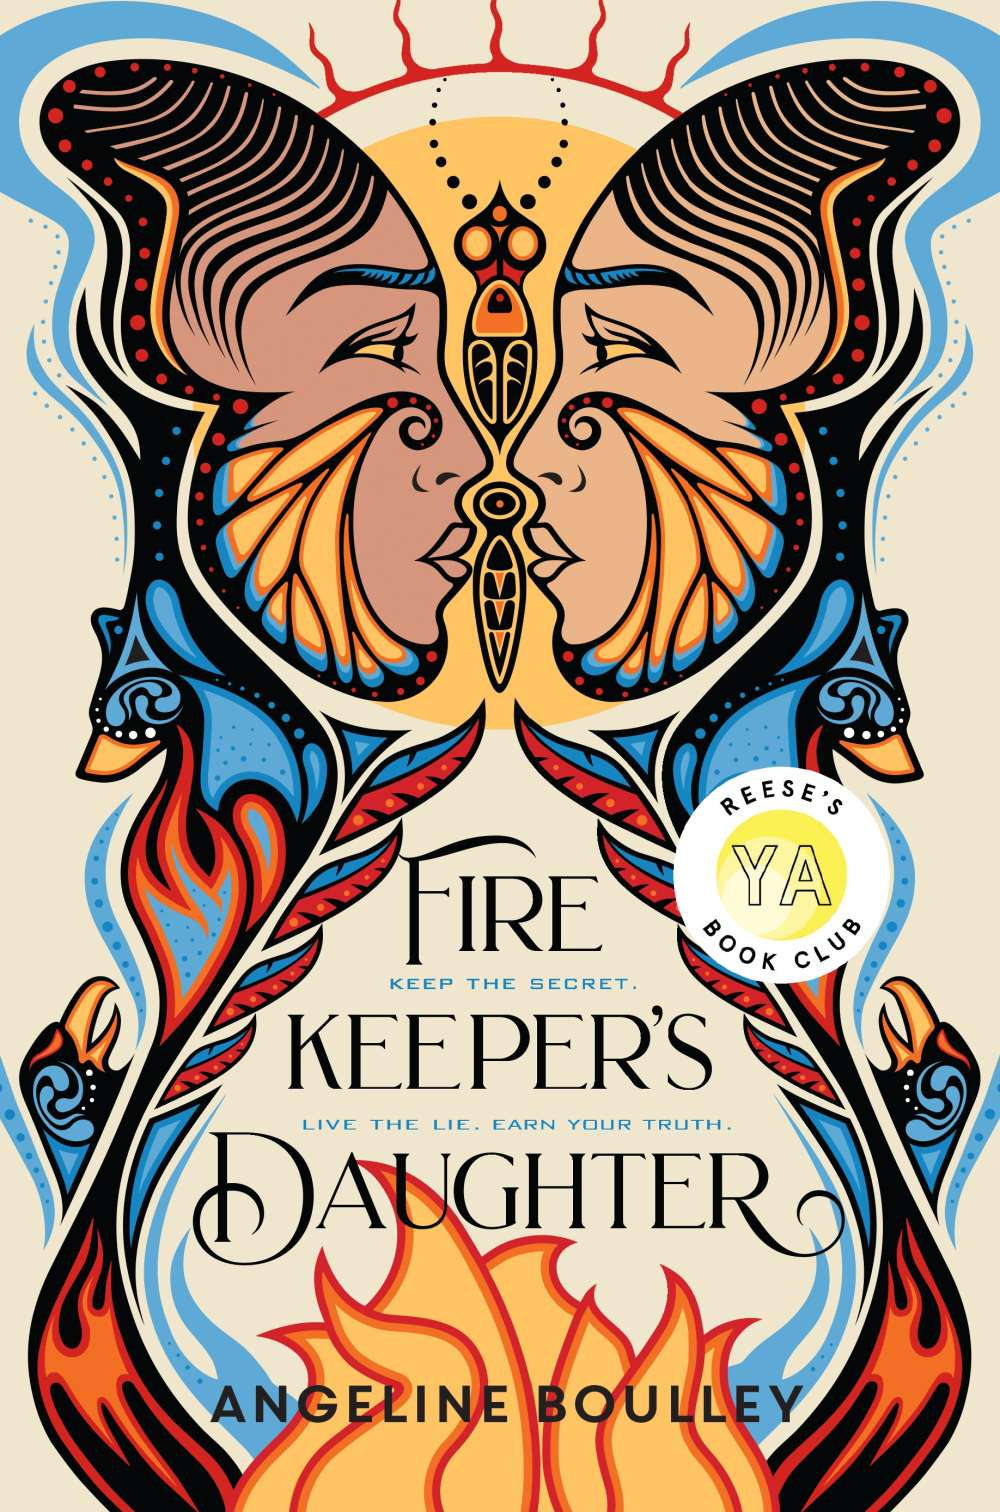 Firekeeper's Daugher by Angeline Boulley